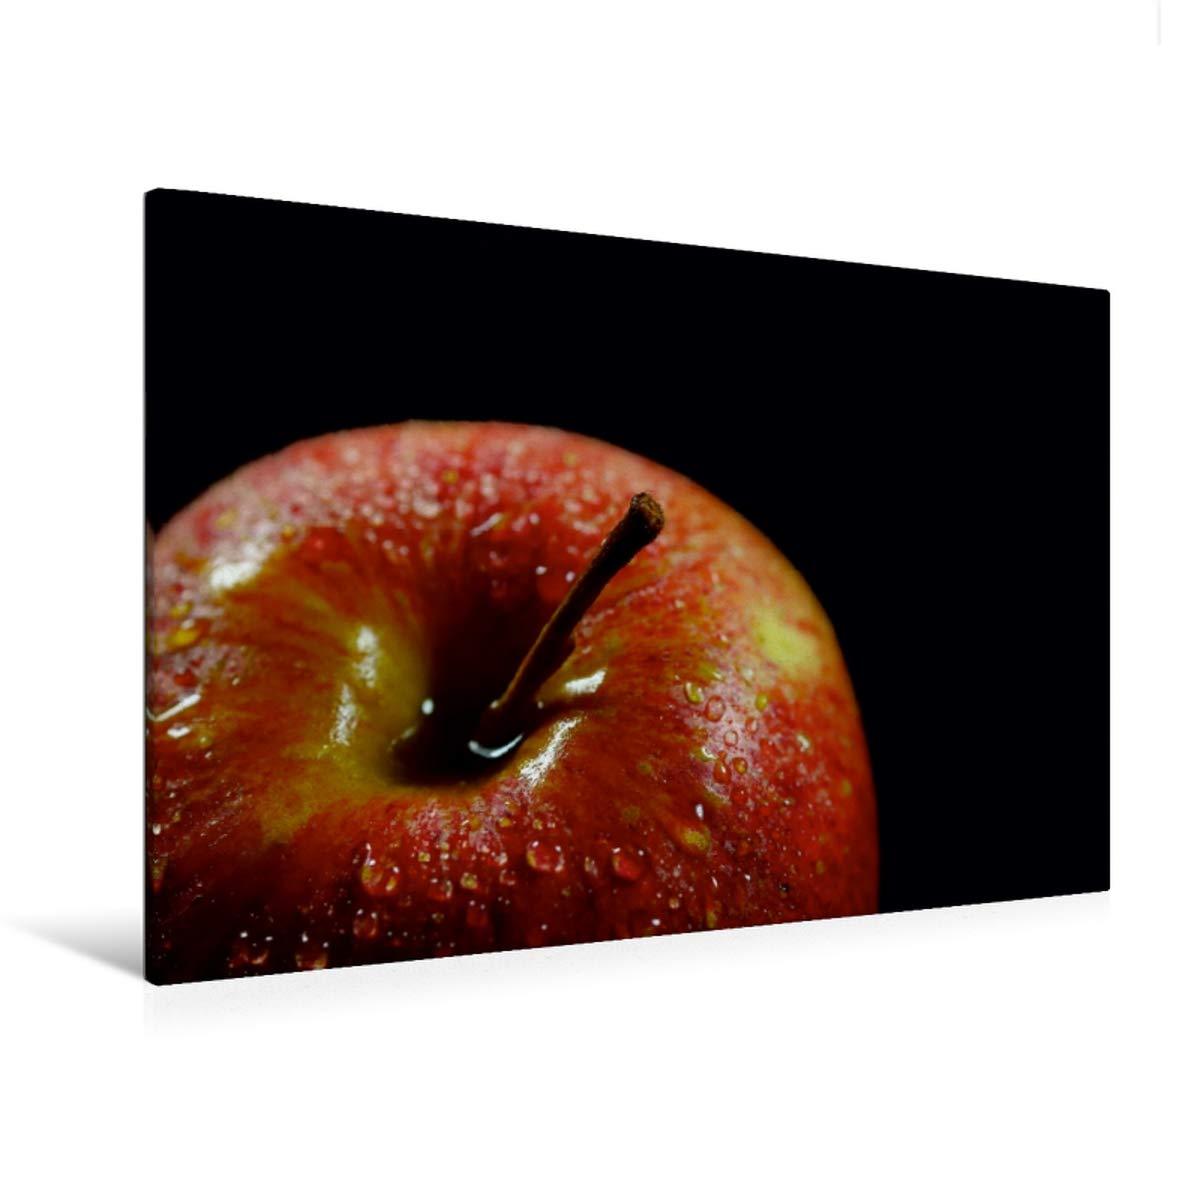 Premium Textil-Leinwand 120 cm x 80 cm quer roter Apfel